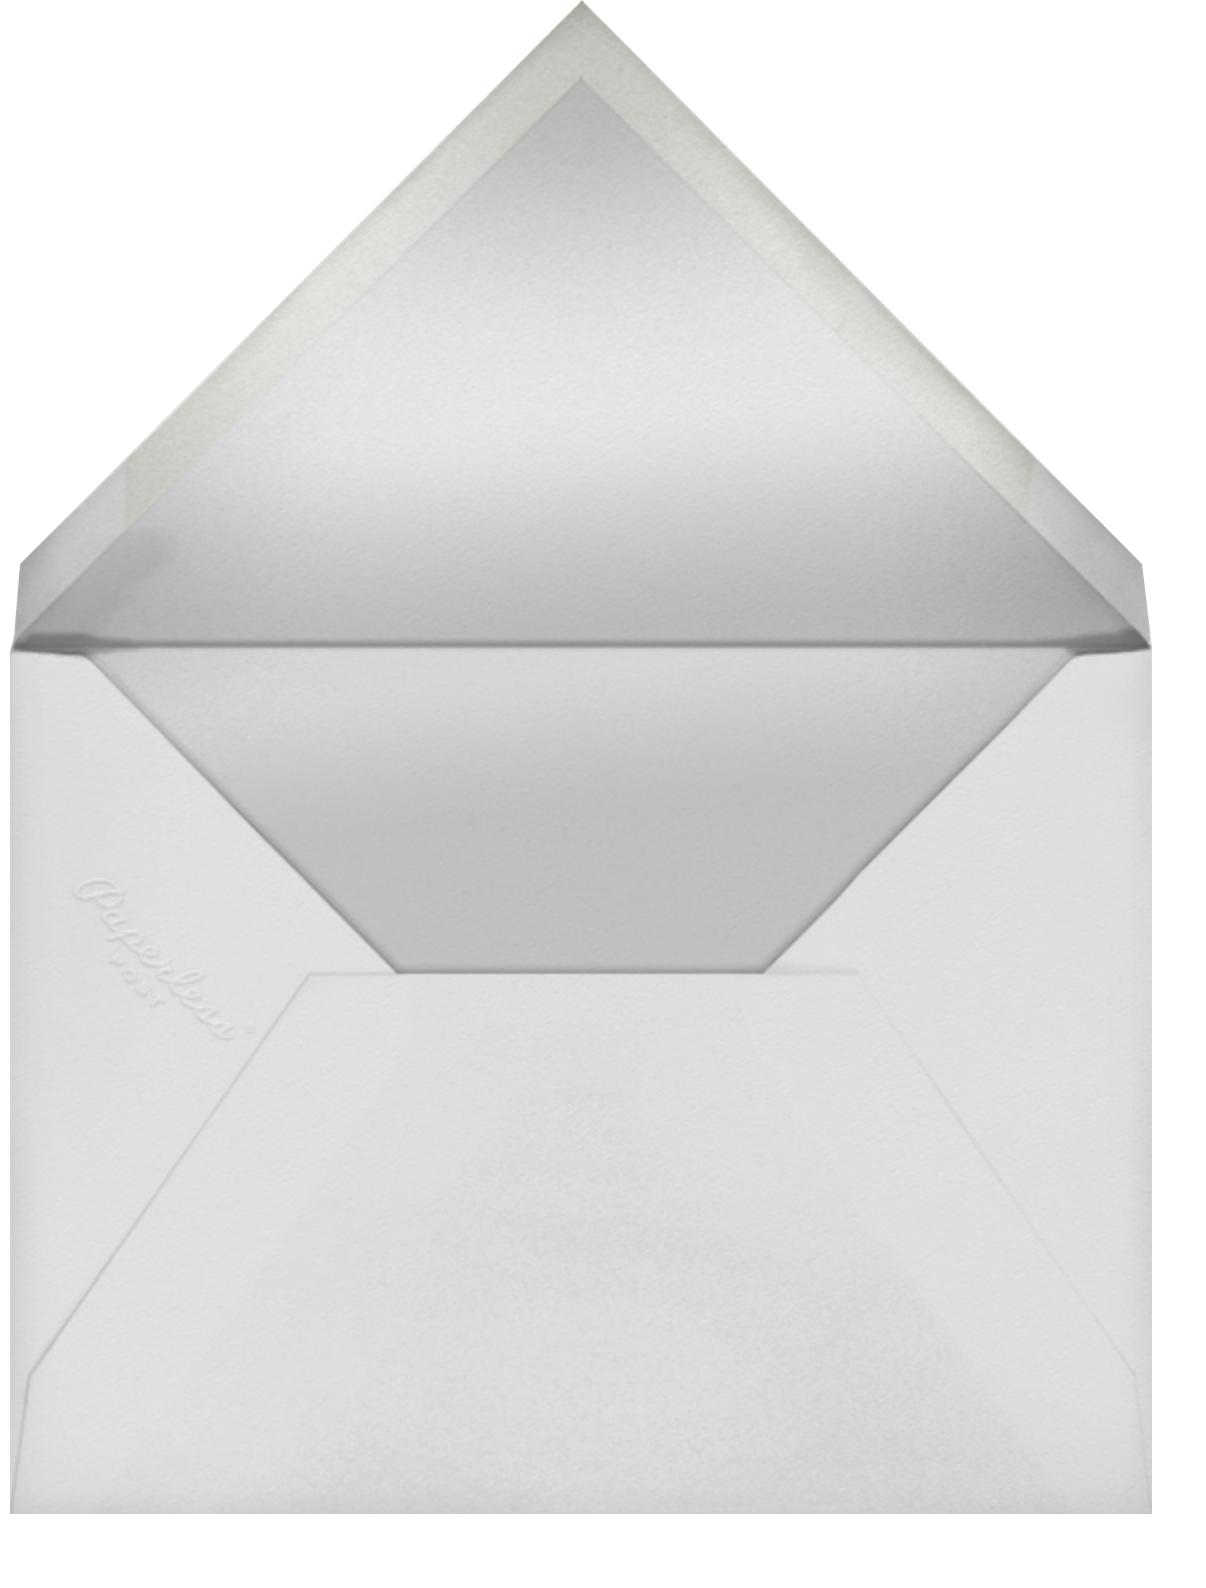 Navy (Tall) - Paperless Post - General entertaining - envelope back